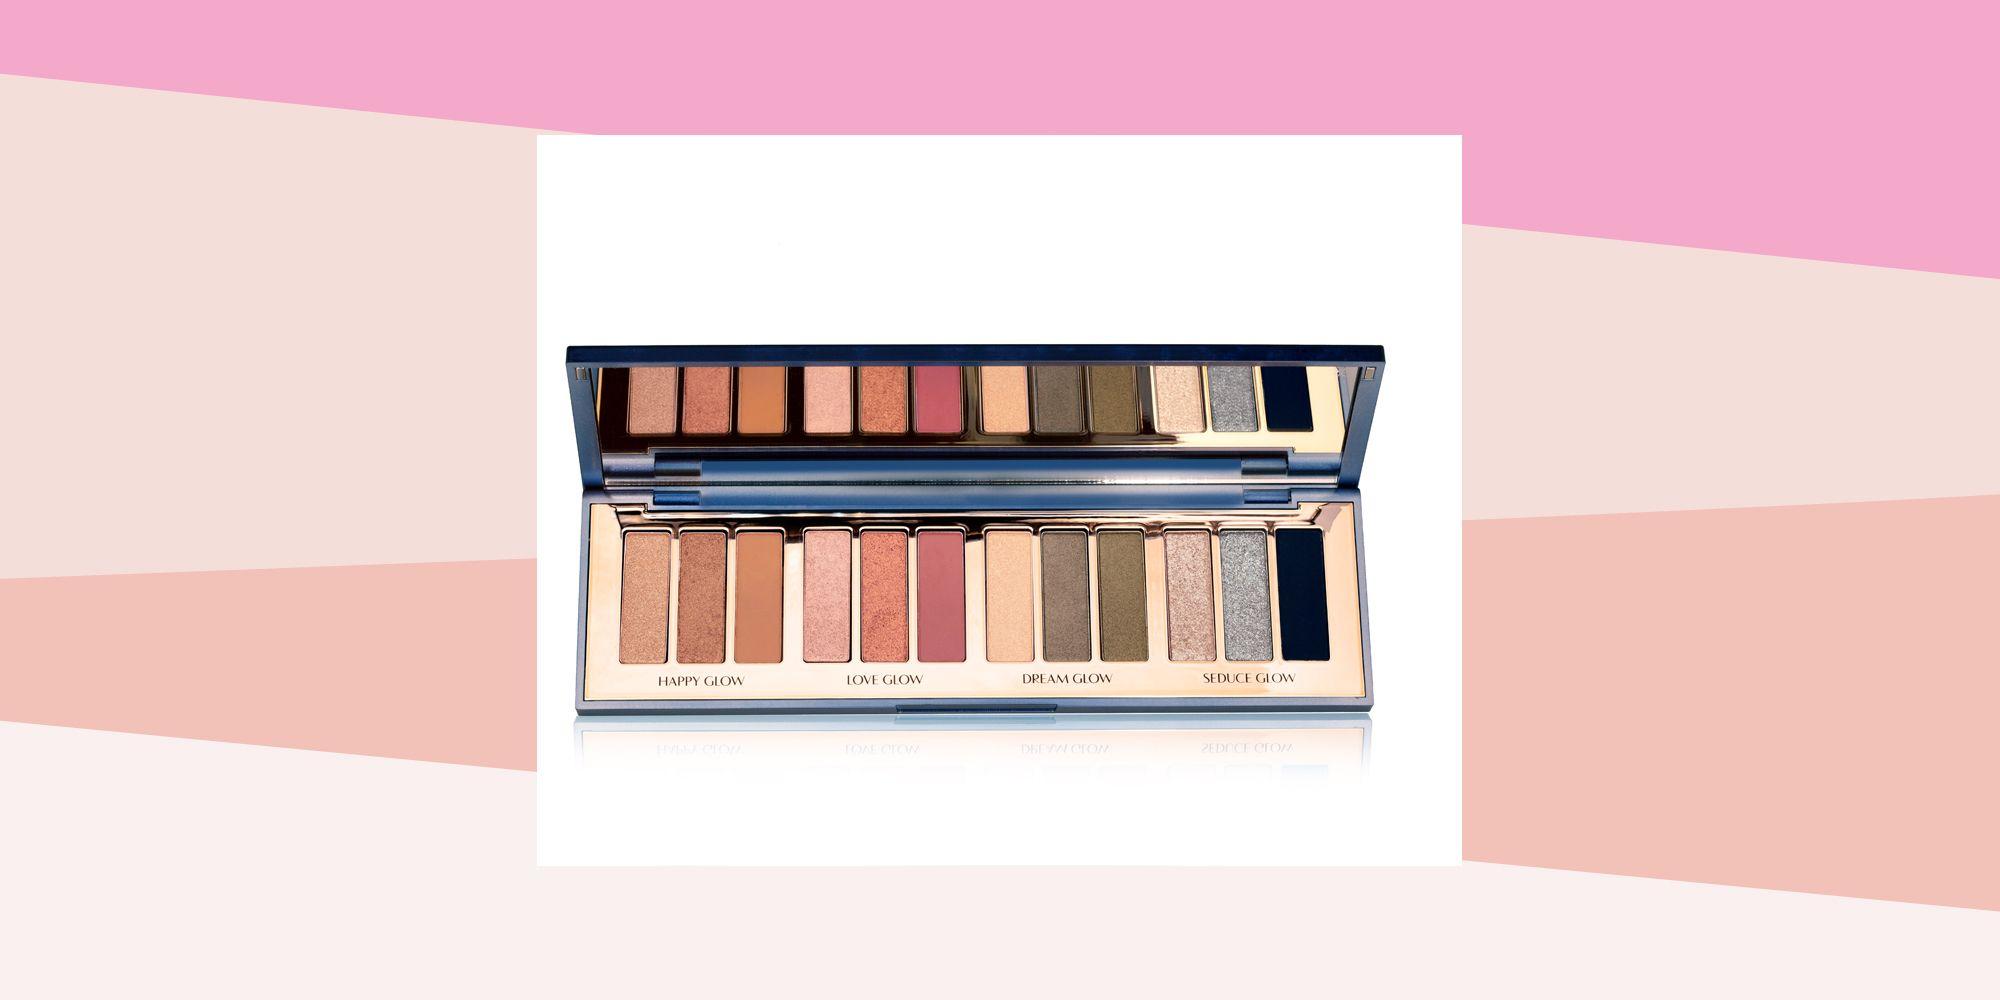 Charlotte Tilbury Announces Her Sell-Out Sensation Instant Eye Palette Is Back